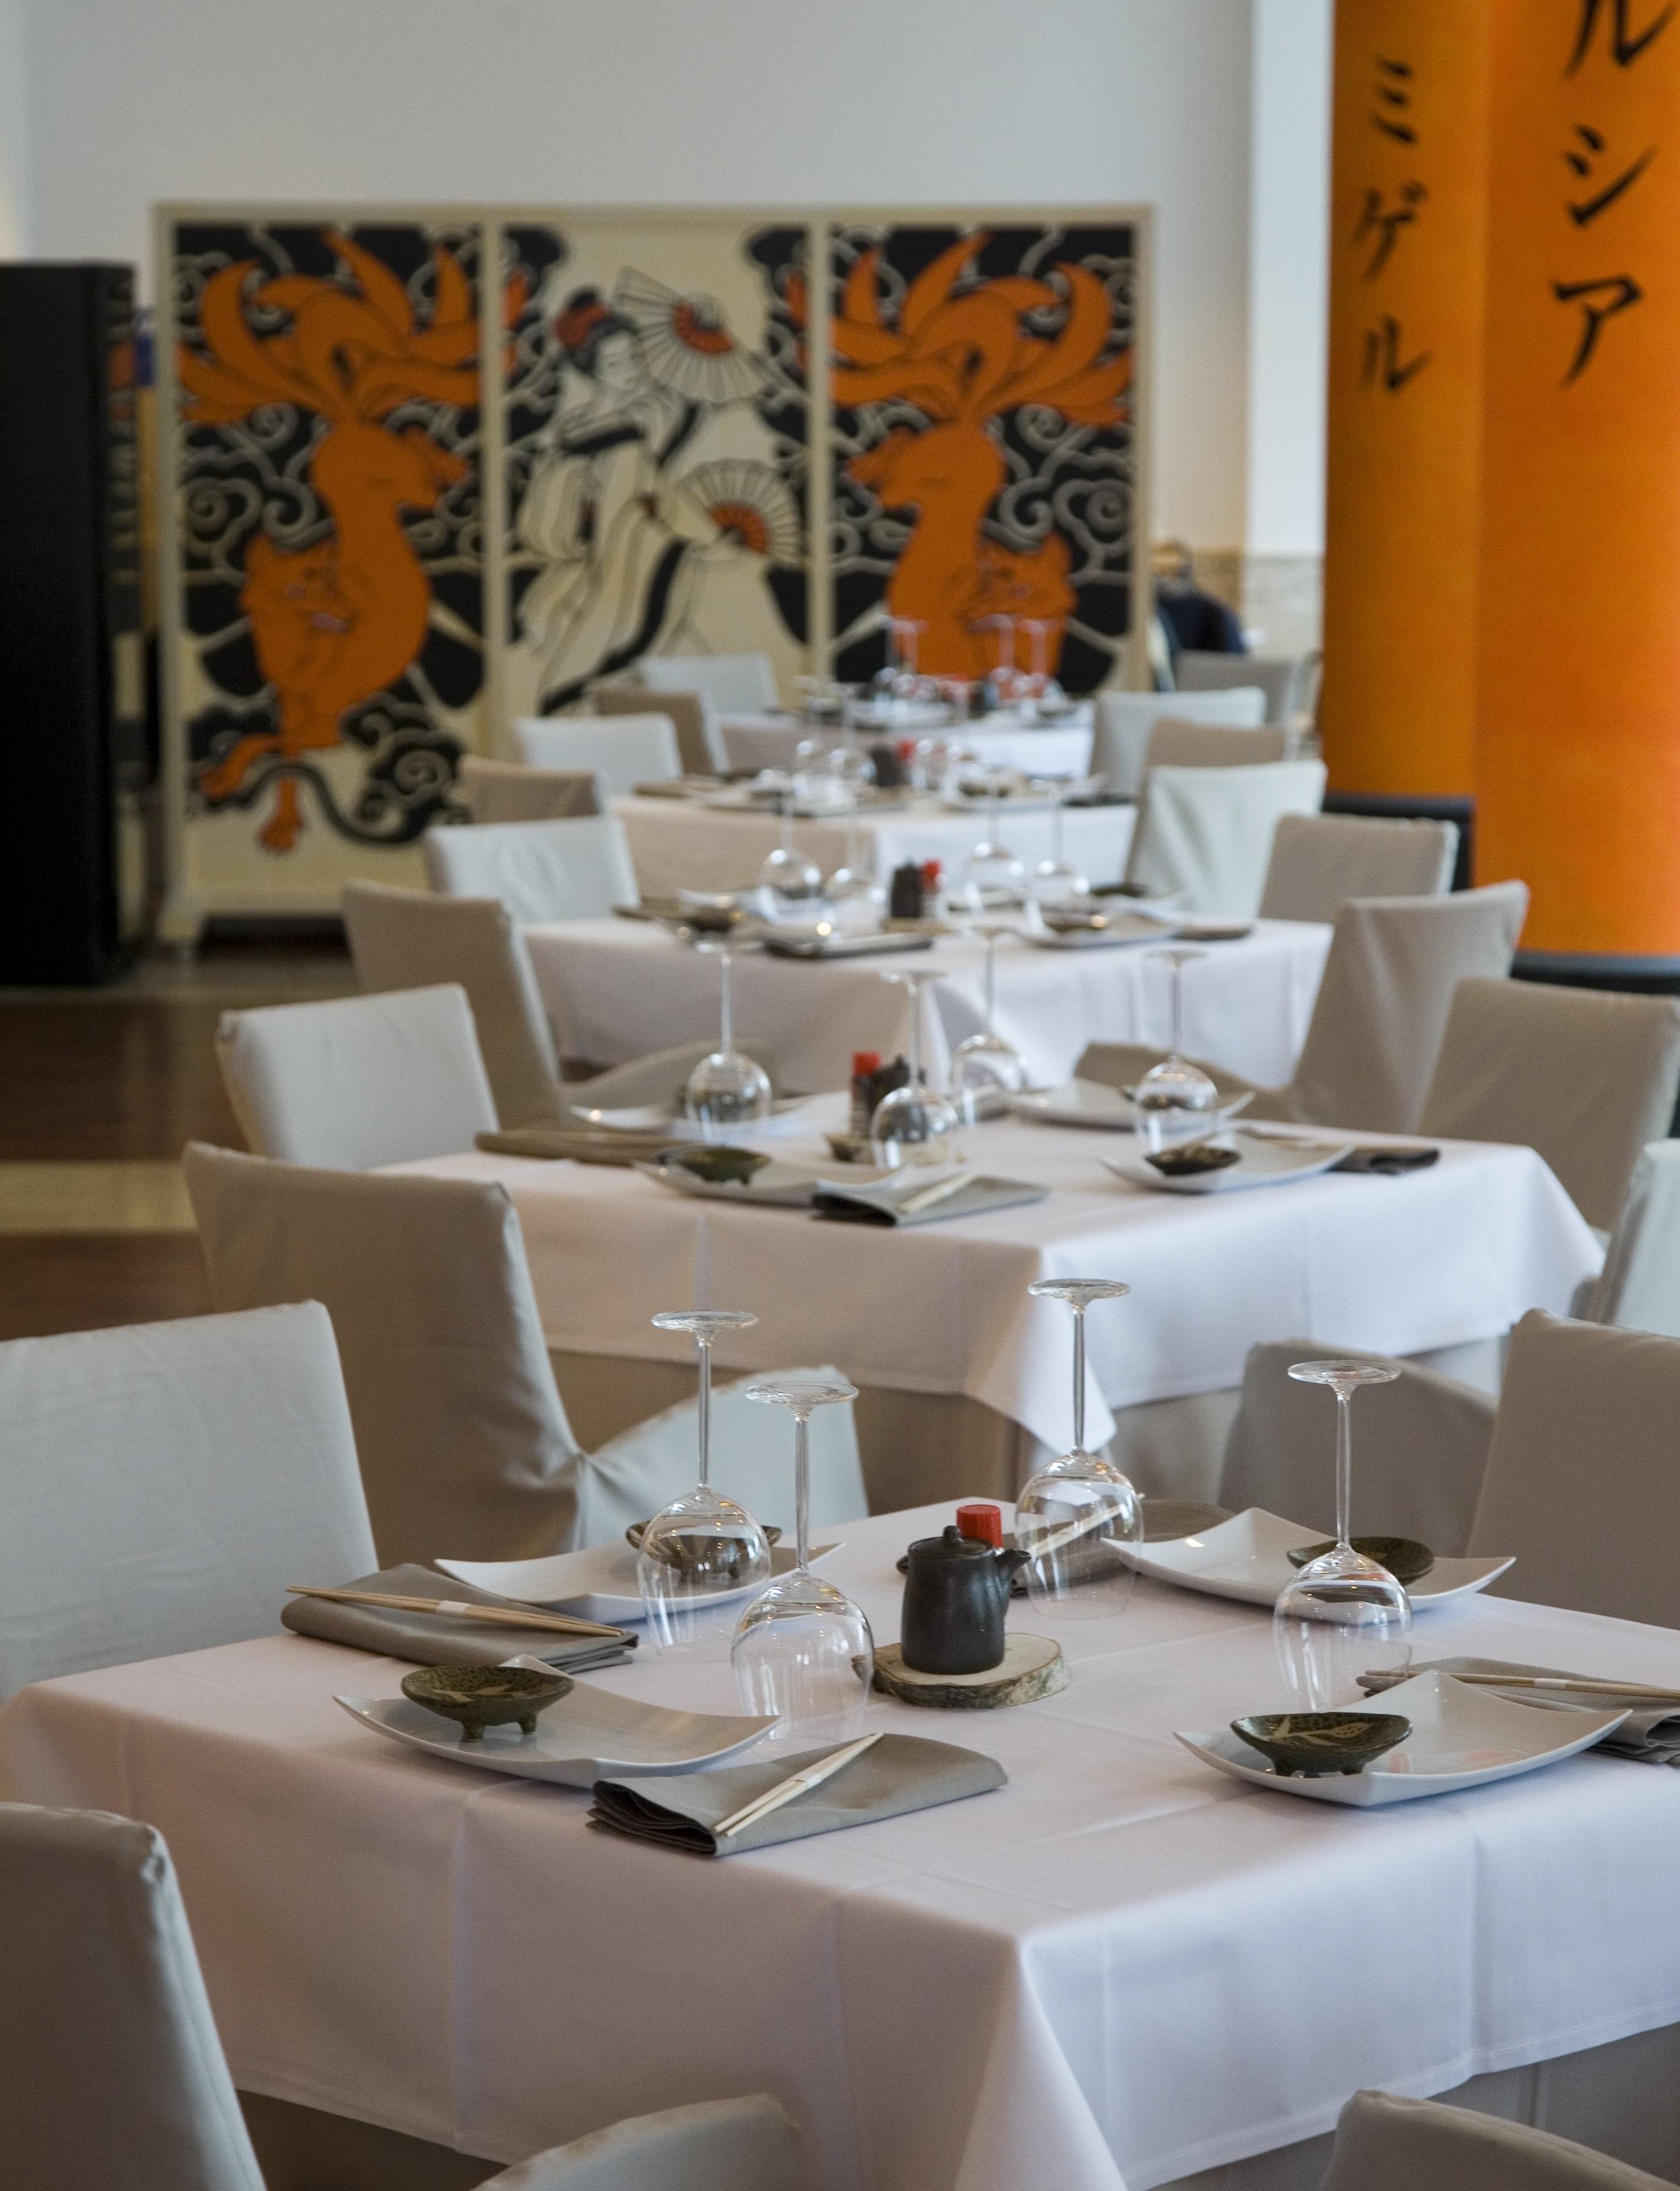 Kitsume restaurante japon s for Restaurante japones alicante